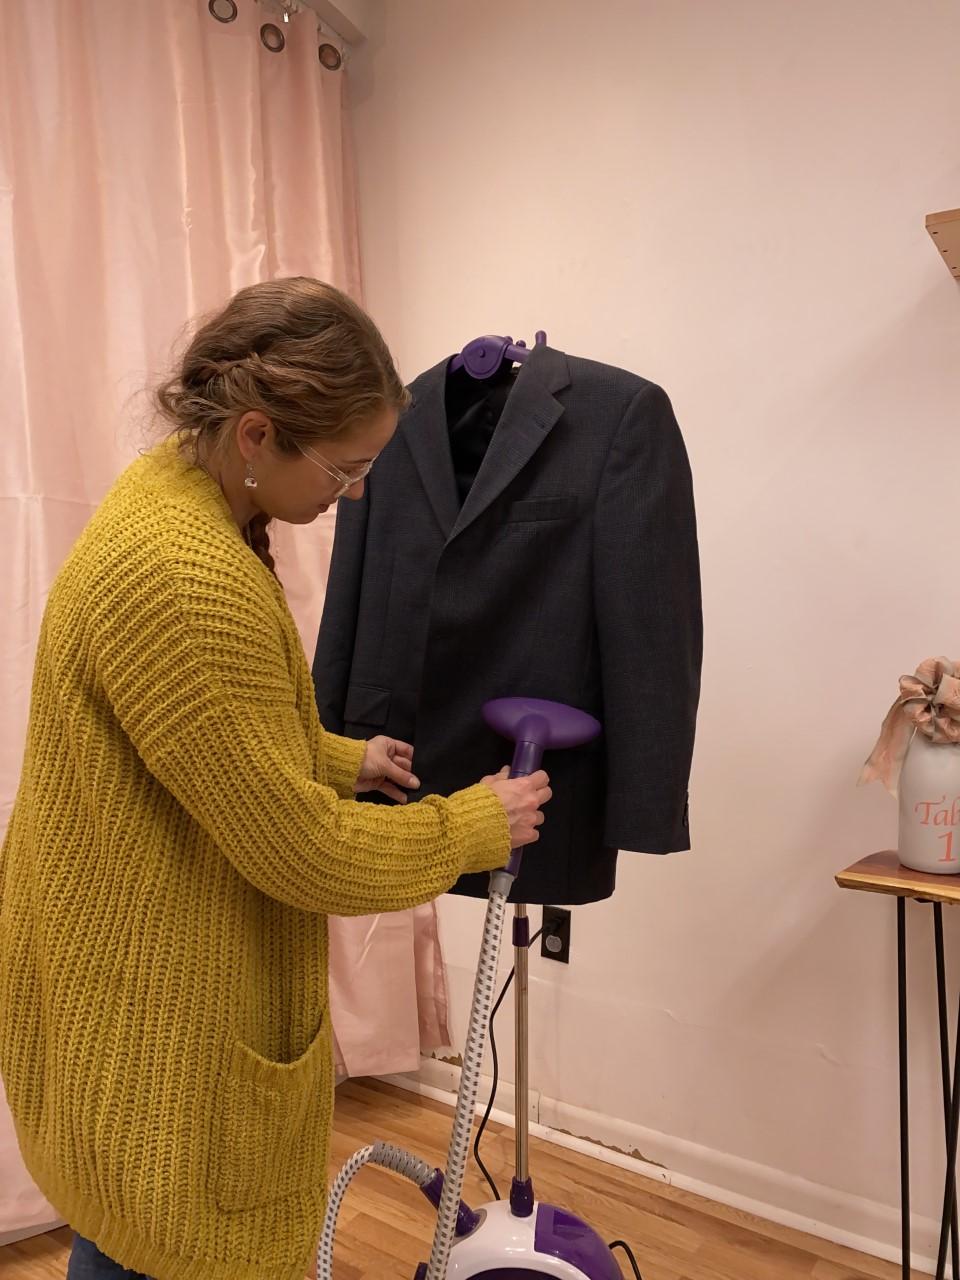 Custom Tailoring/Alterations